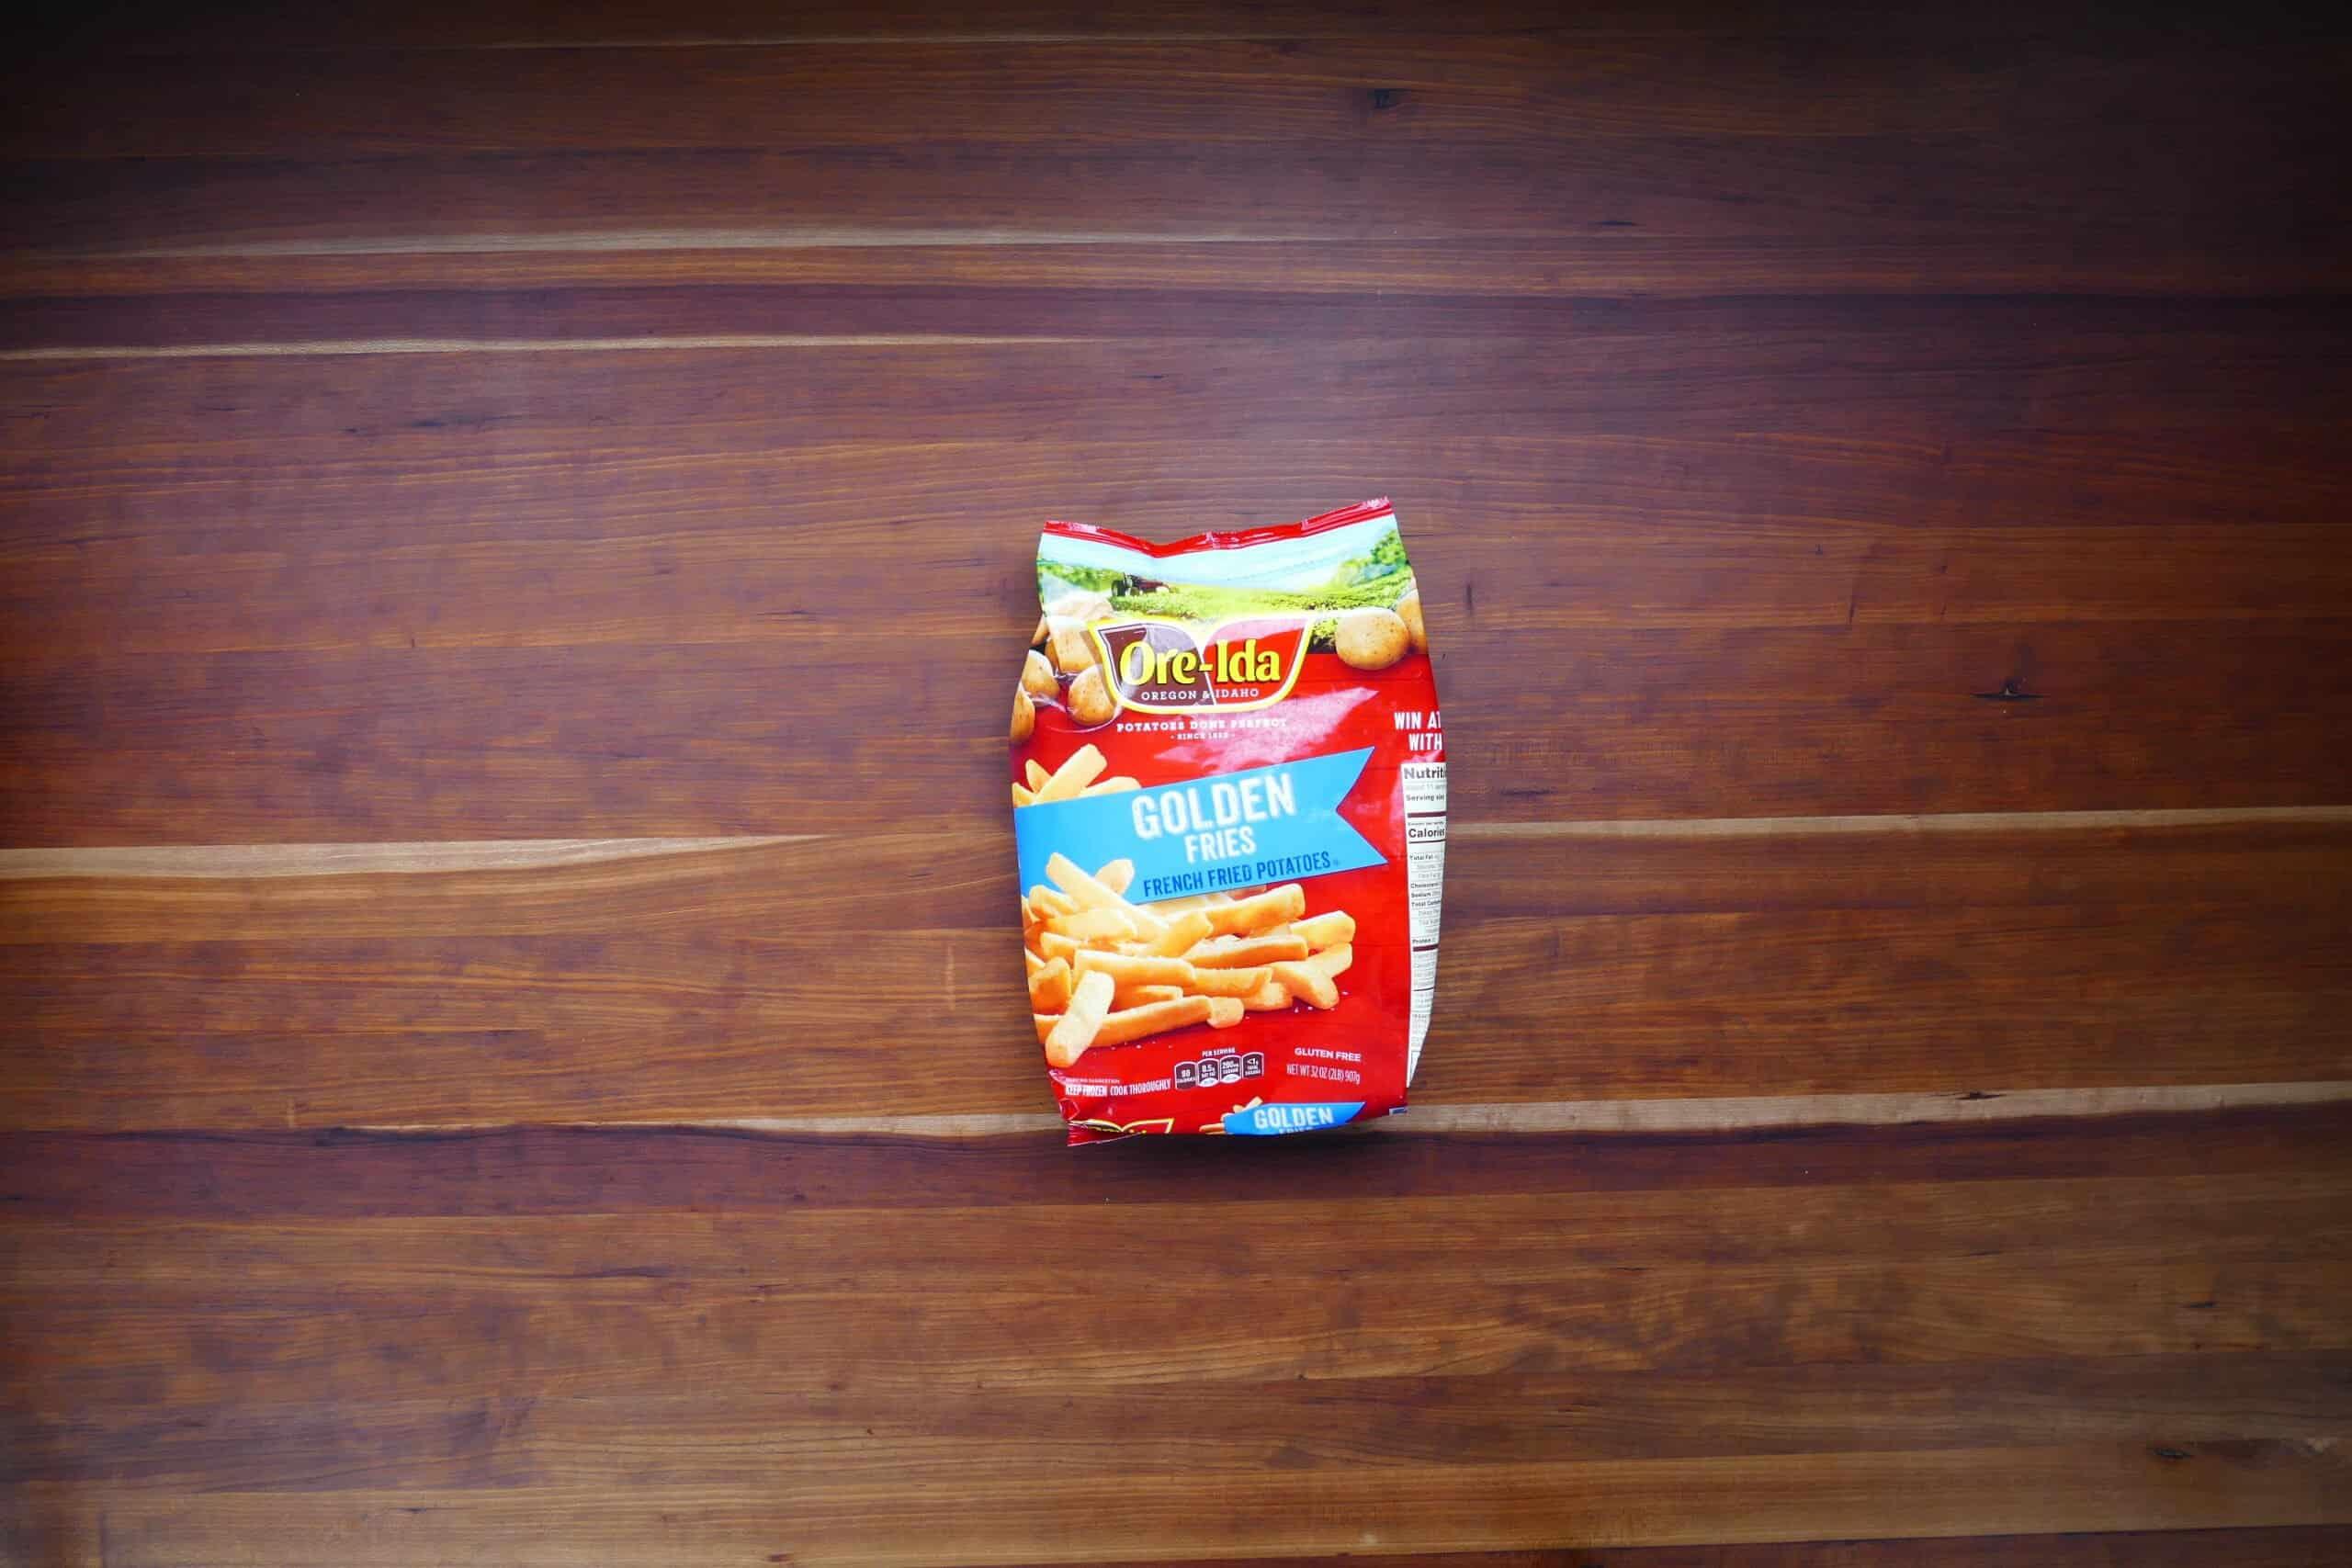 Bag of Ore Ida golden fries french fried potatoes